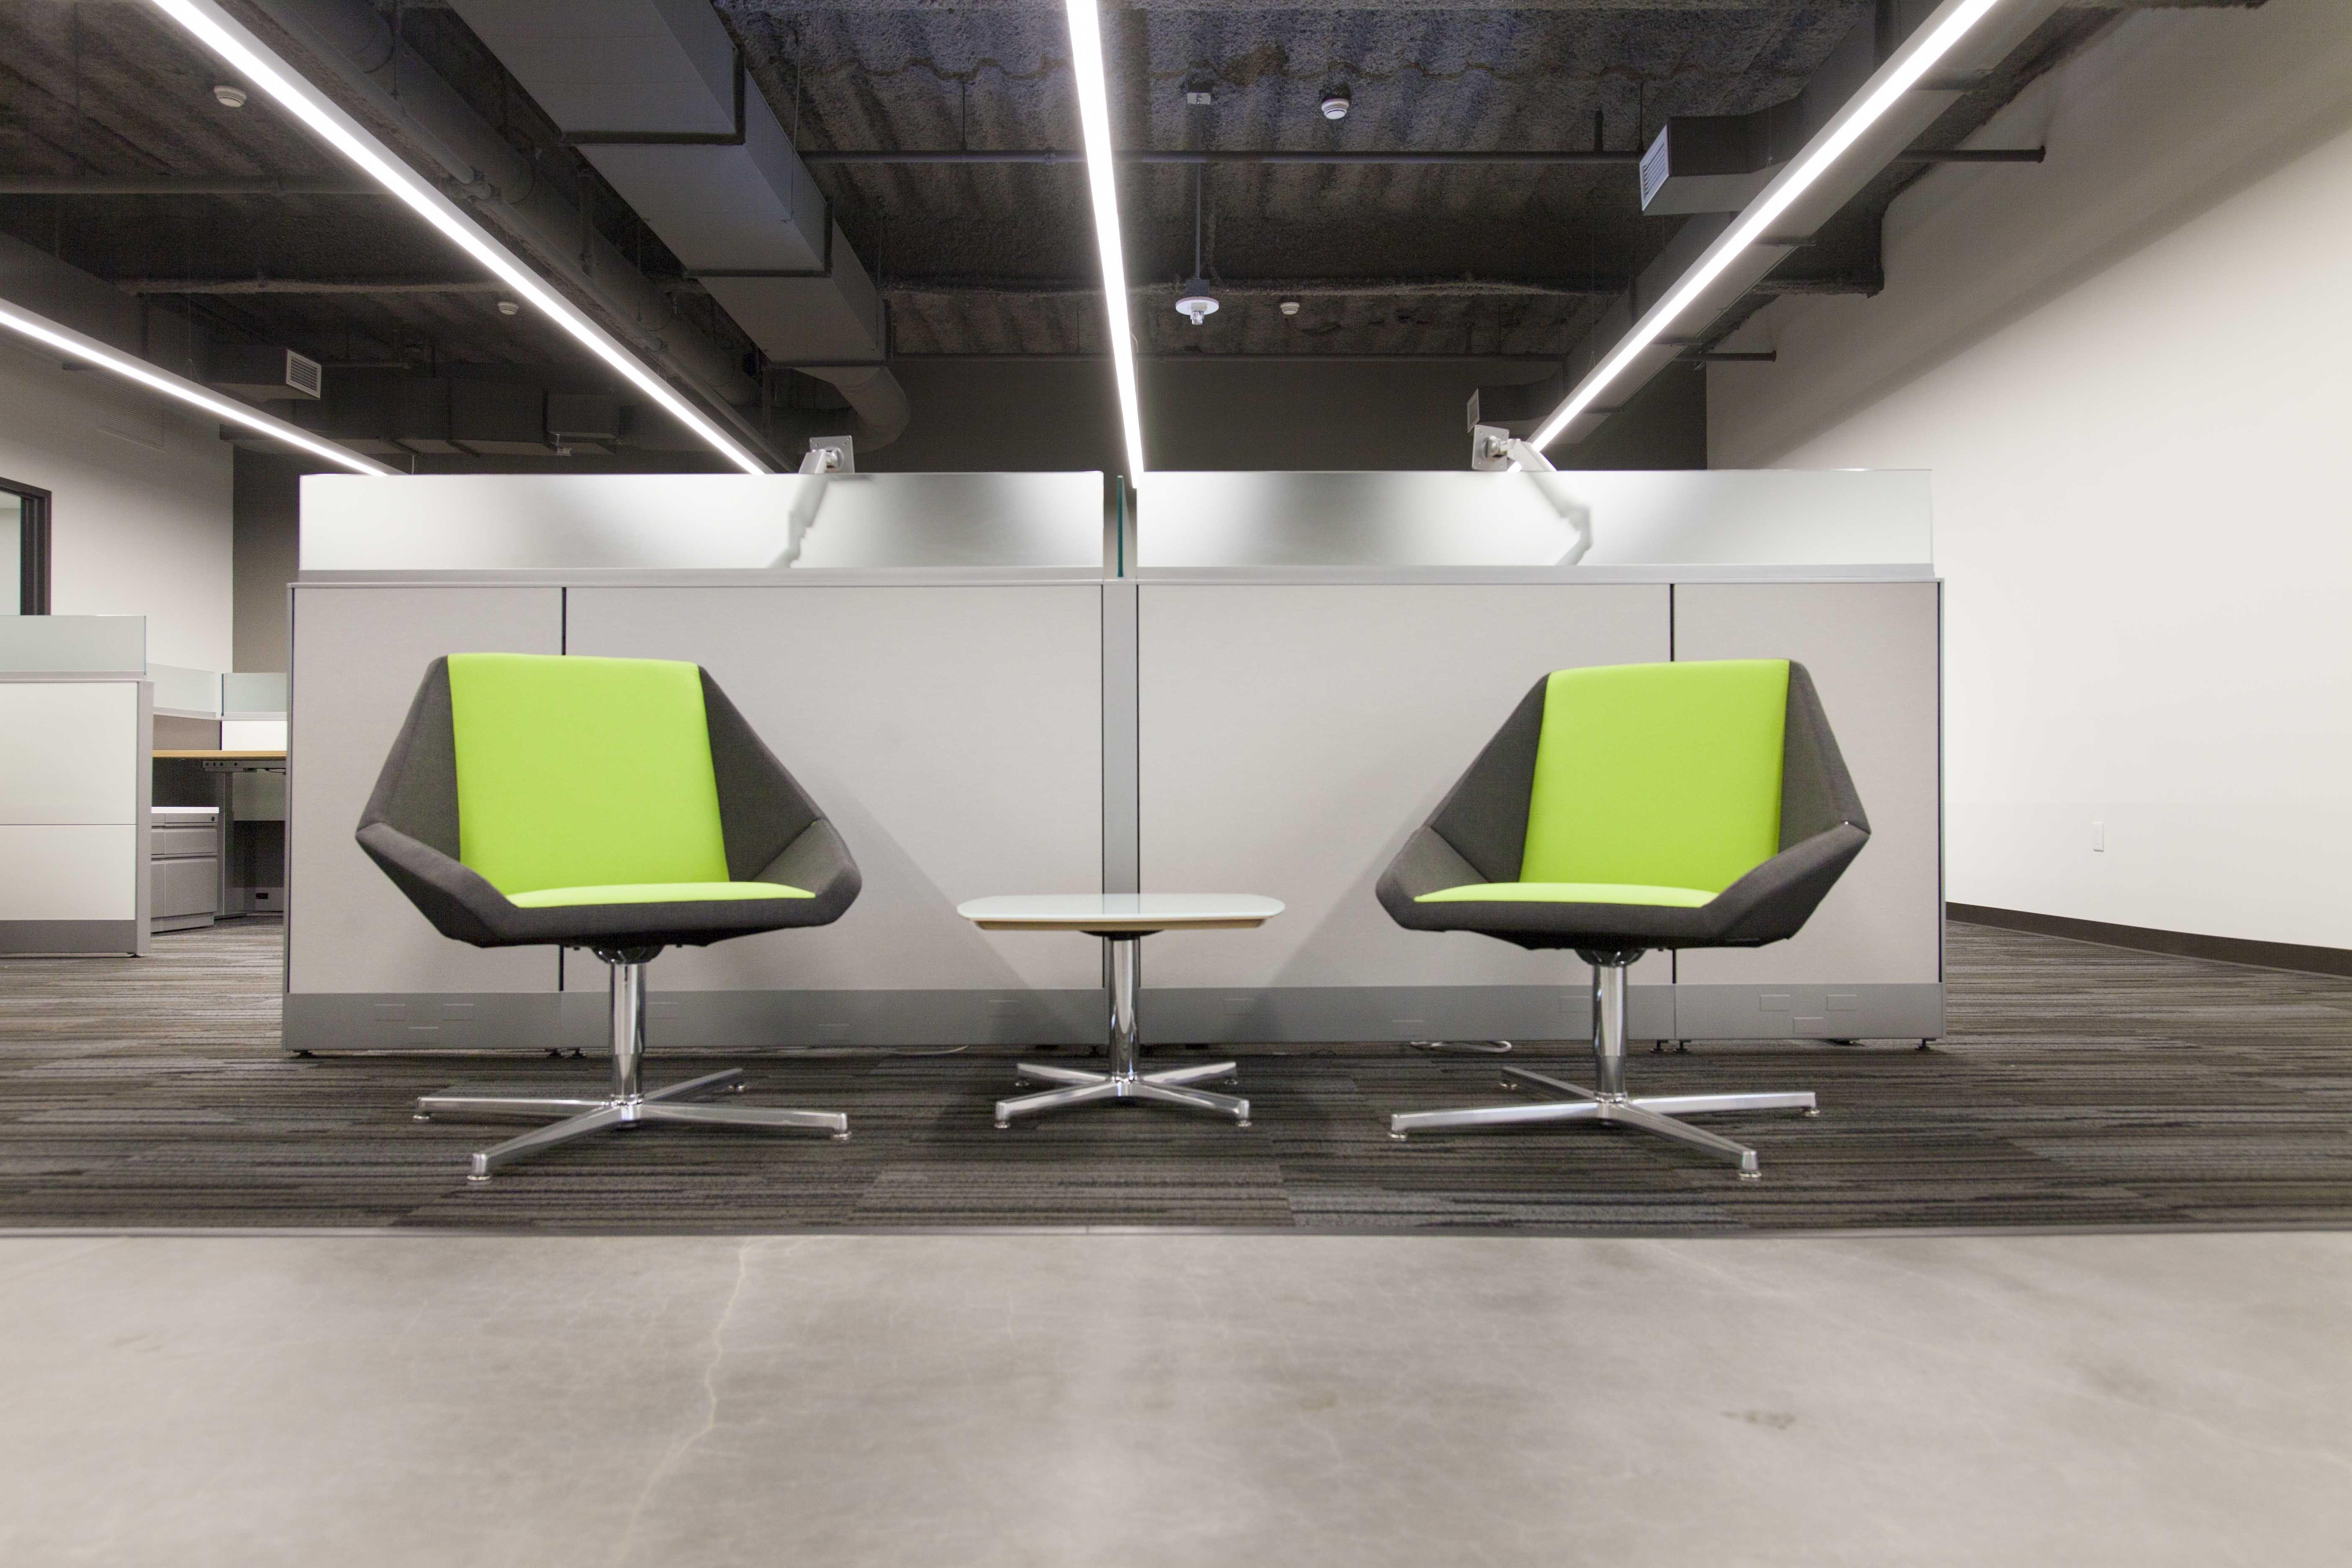 Swell Nios Lounge Corporate Office Furniture Installation Beatyapartments Chair Design Images Beatyapartmentscom